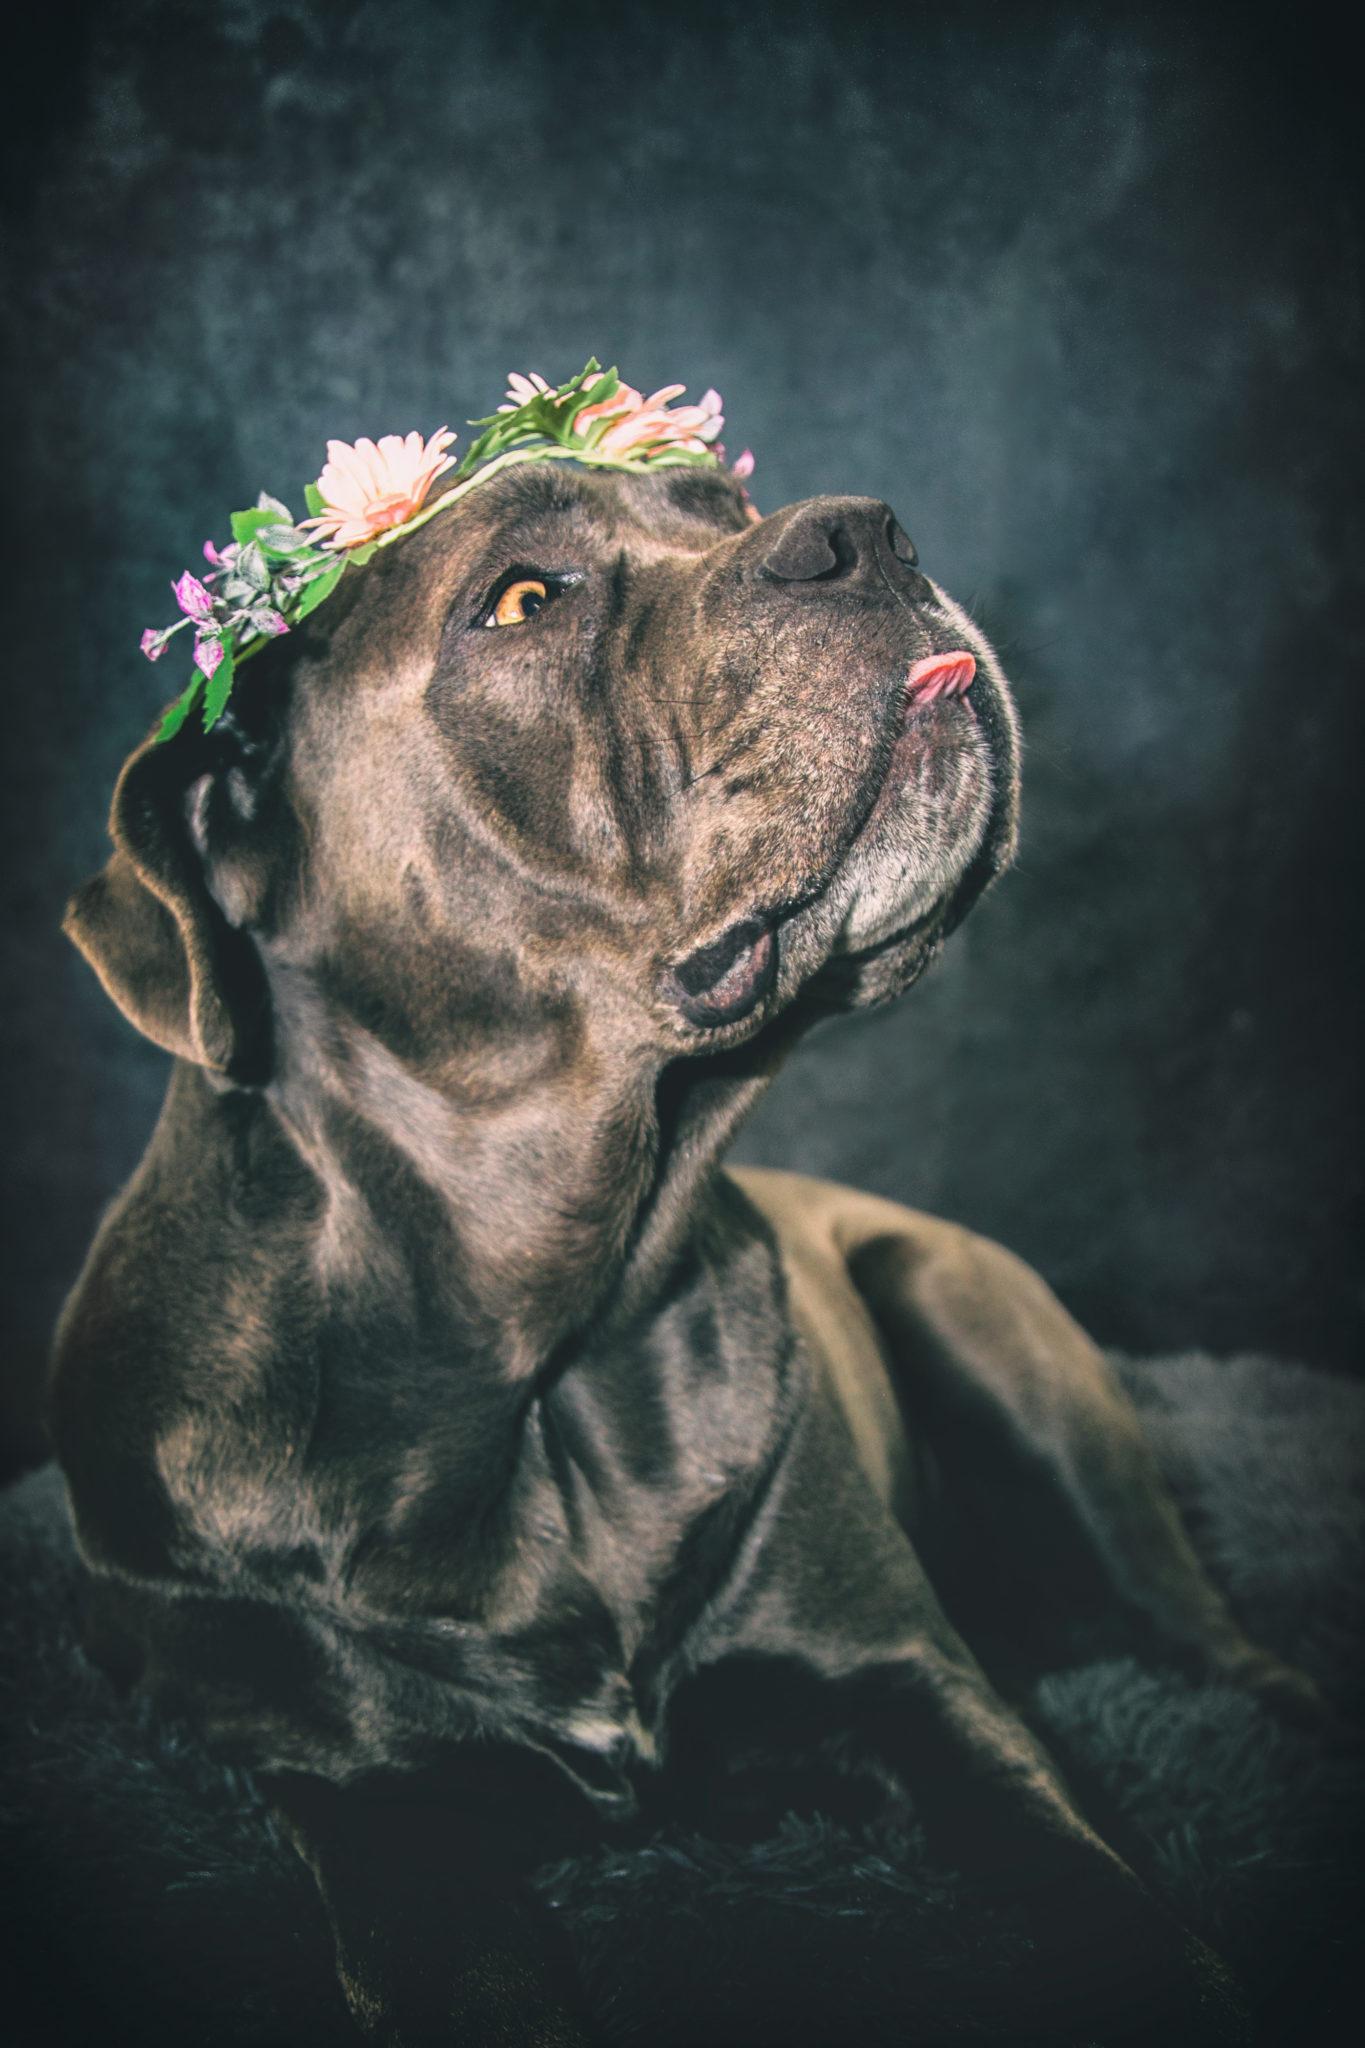 Photographe animal de compagnie, chien, Cane Corso